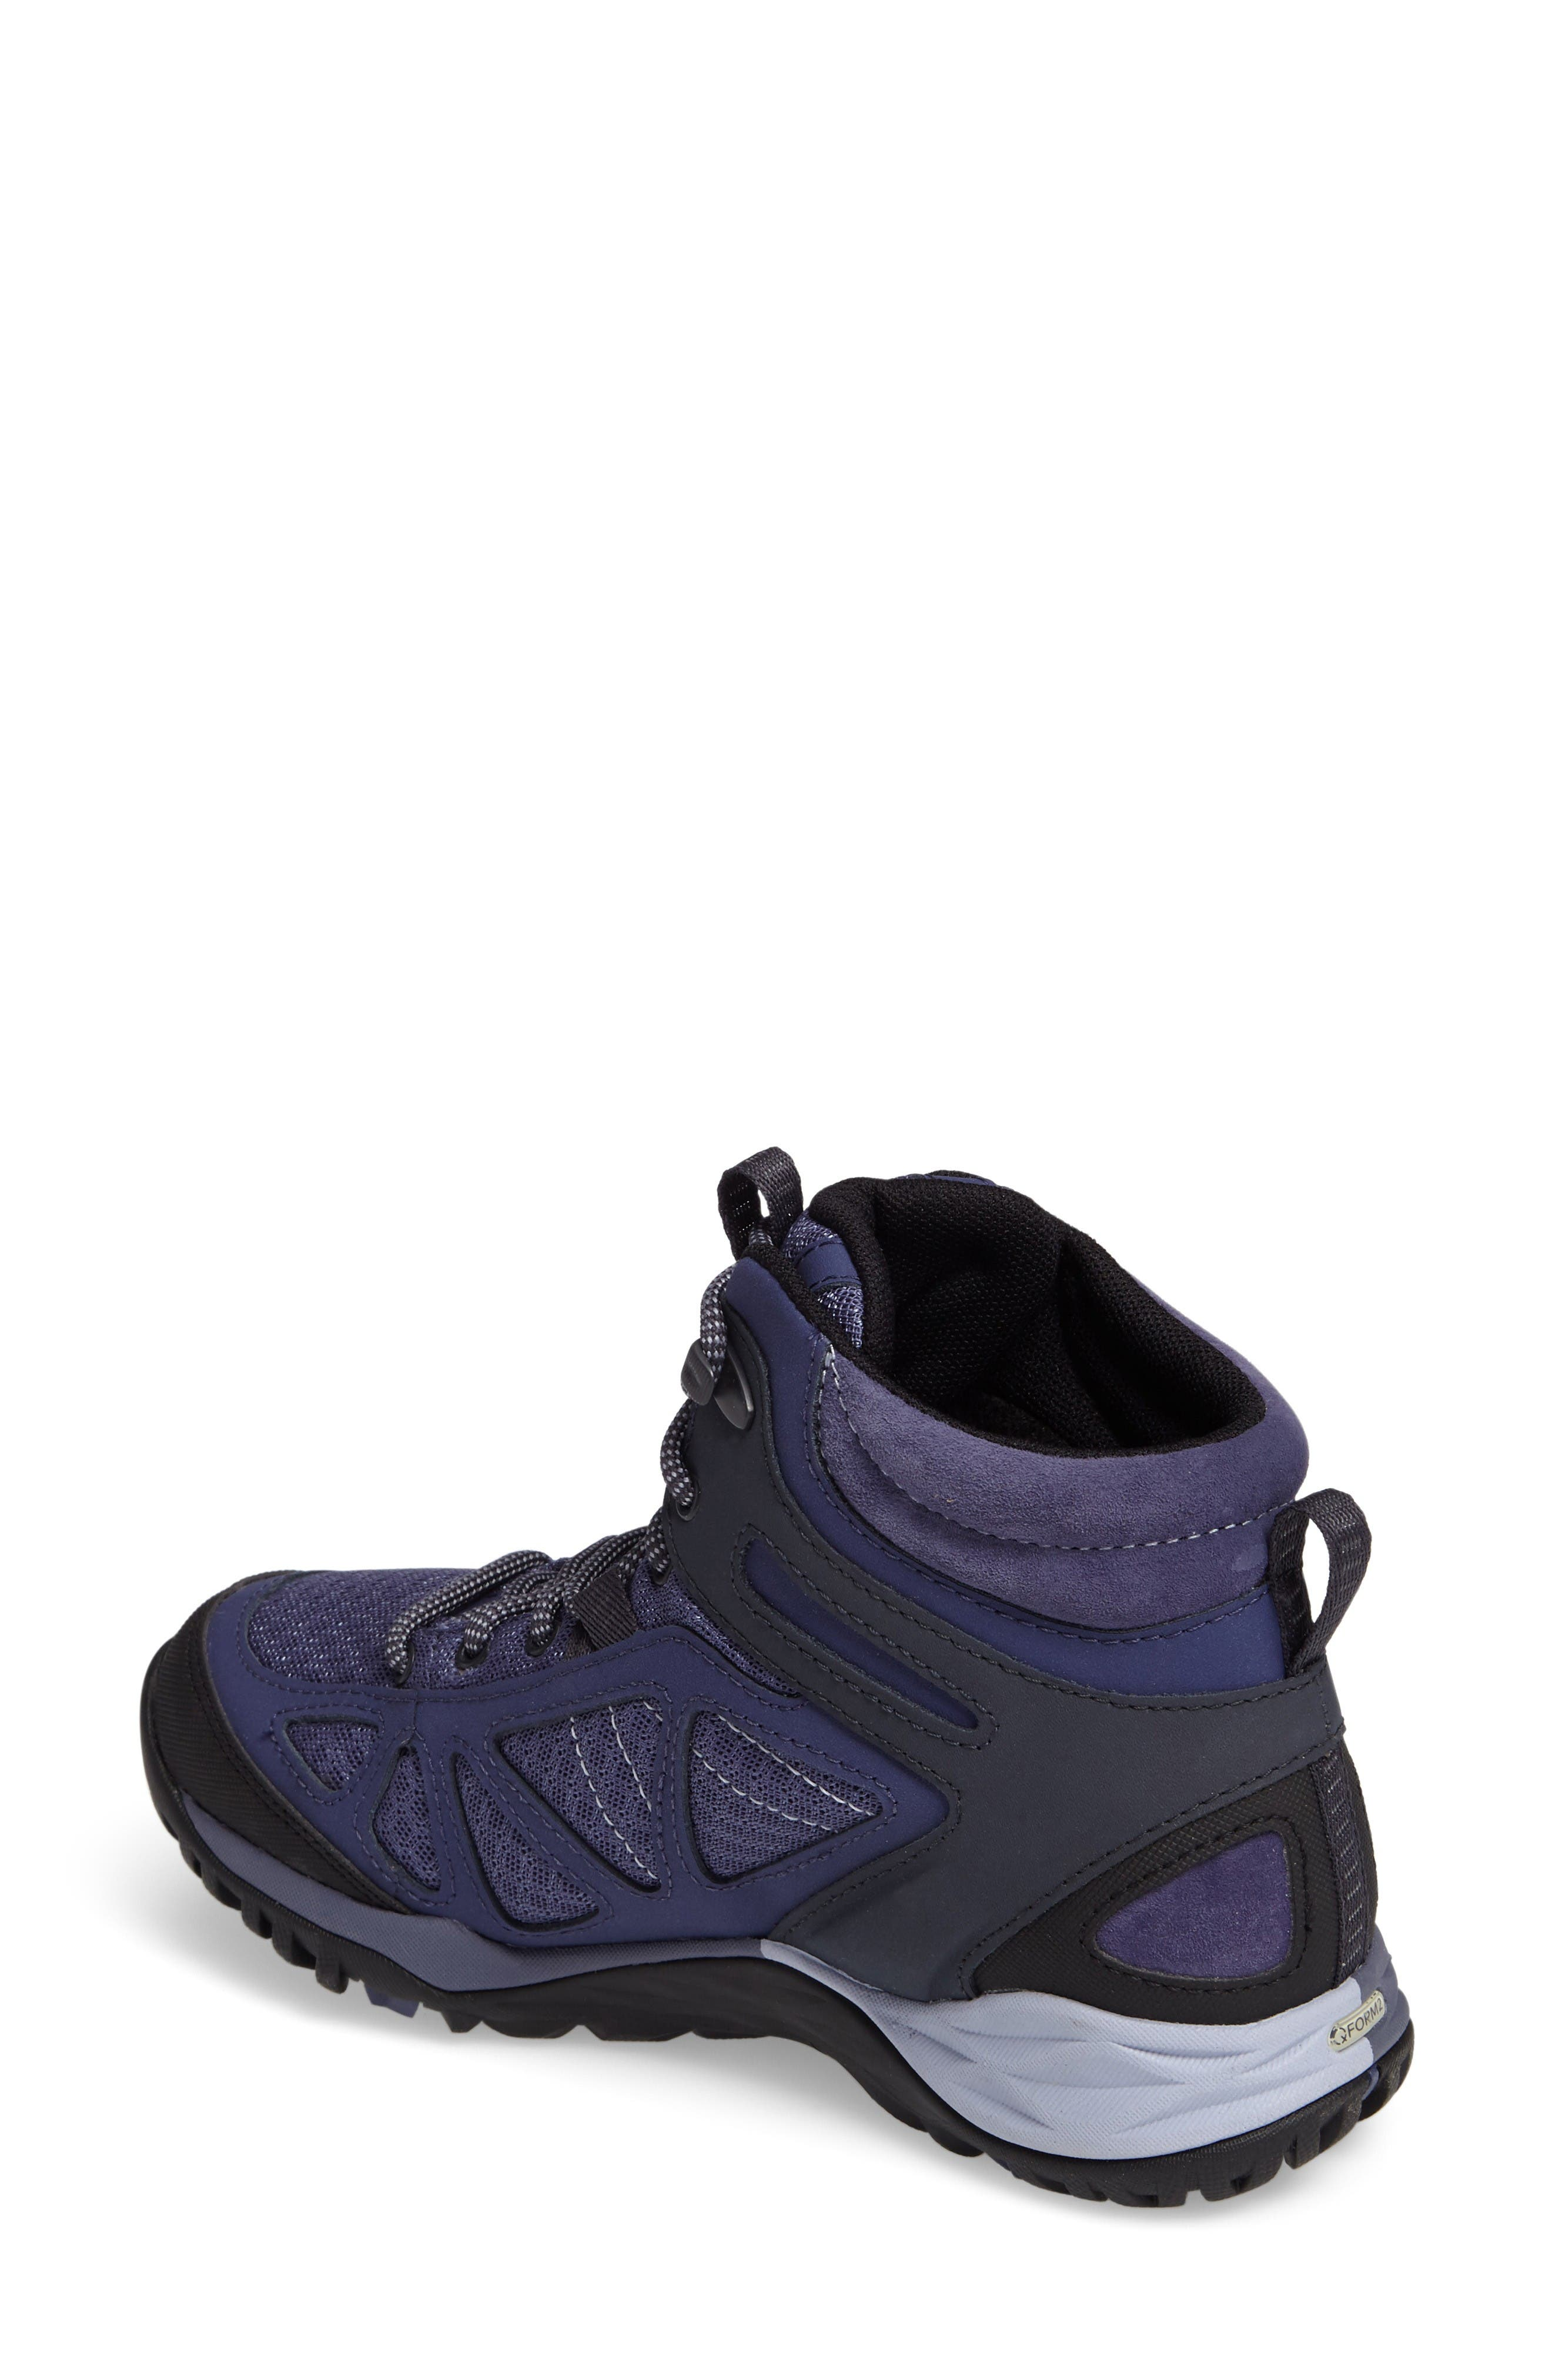 Siren Sport Q2 Waterproof Mid Top Sneaker,                             Alternate thumbnail 2, color,                             Crown Blue Nubuck Leather